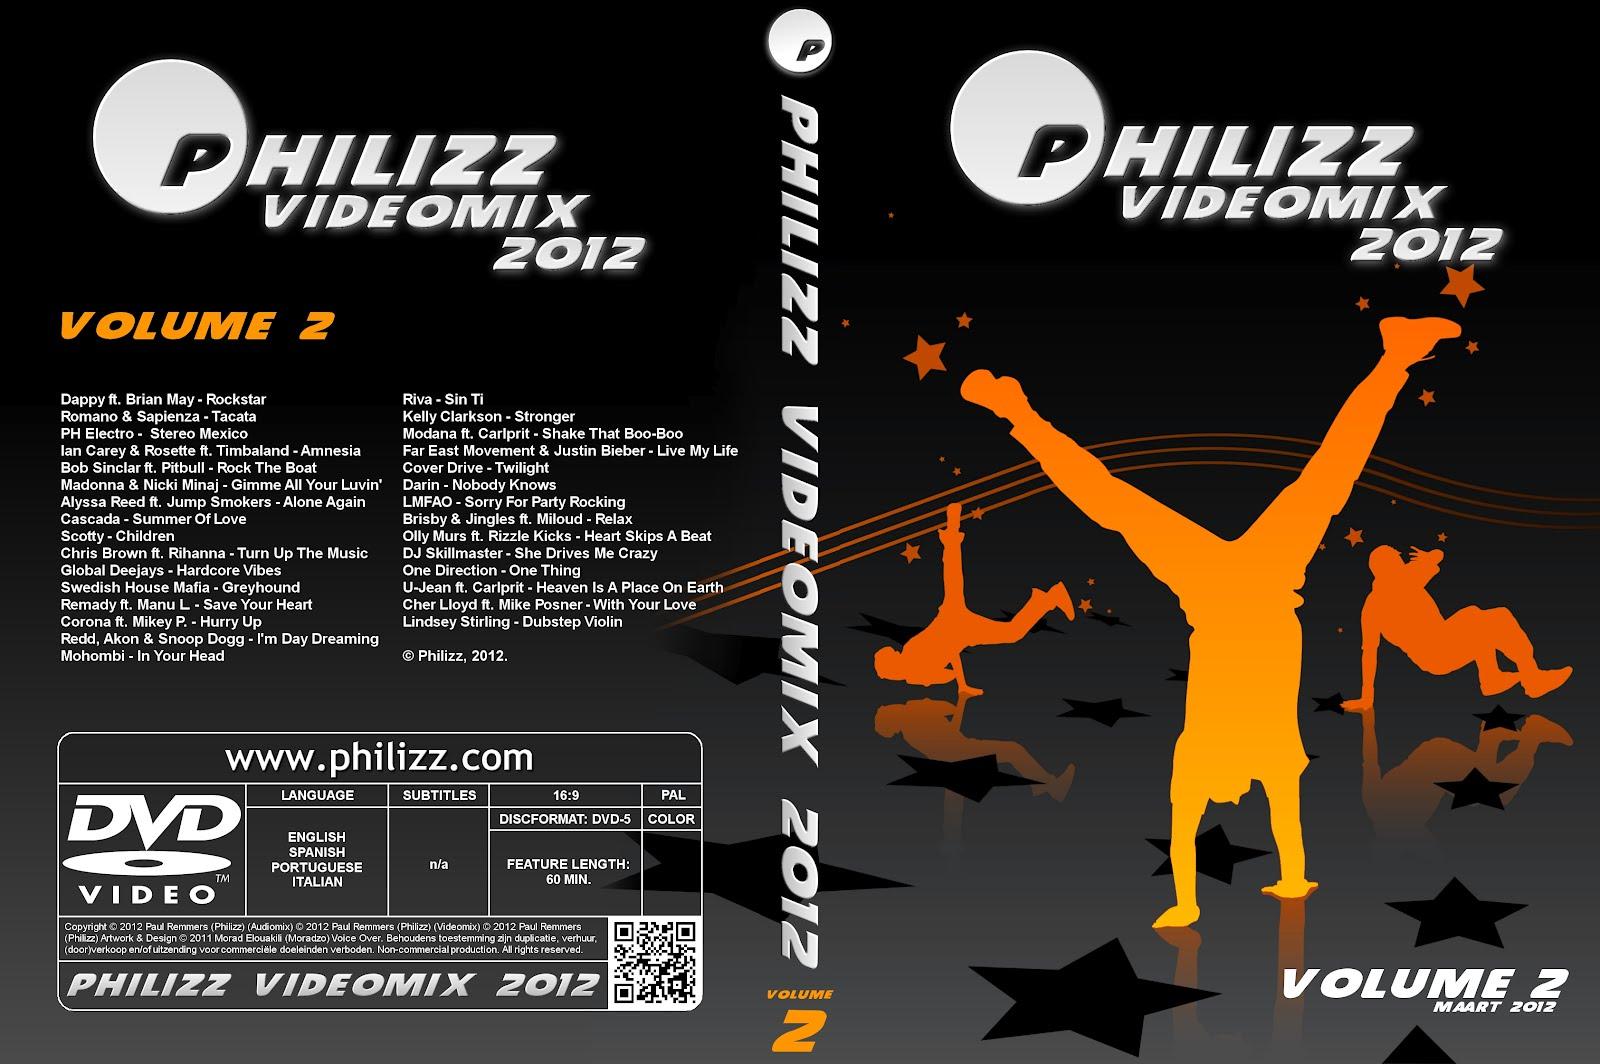 http://1.bp.blogspot.com/-uxq03fUG-V8/UEp8zmmlq2I/AAAAAAAAHo4/Qg8fYKCQcpU/s1600/DVDCOVR-VOL2.jpg